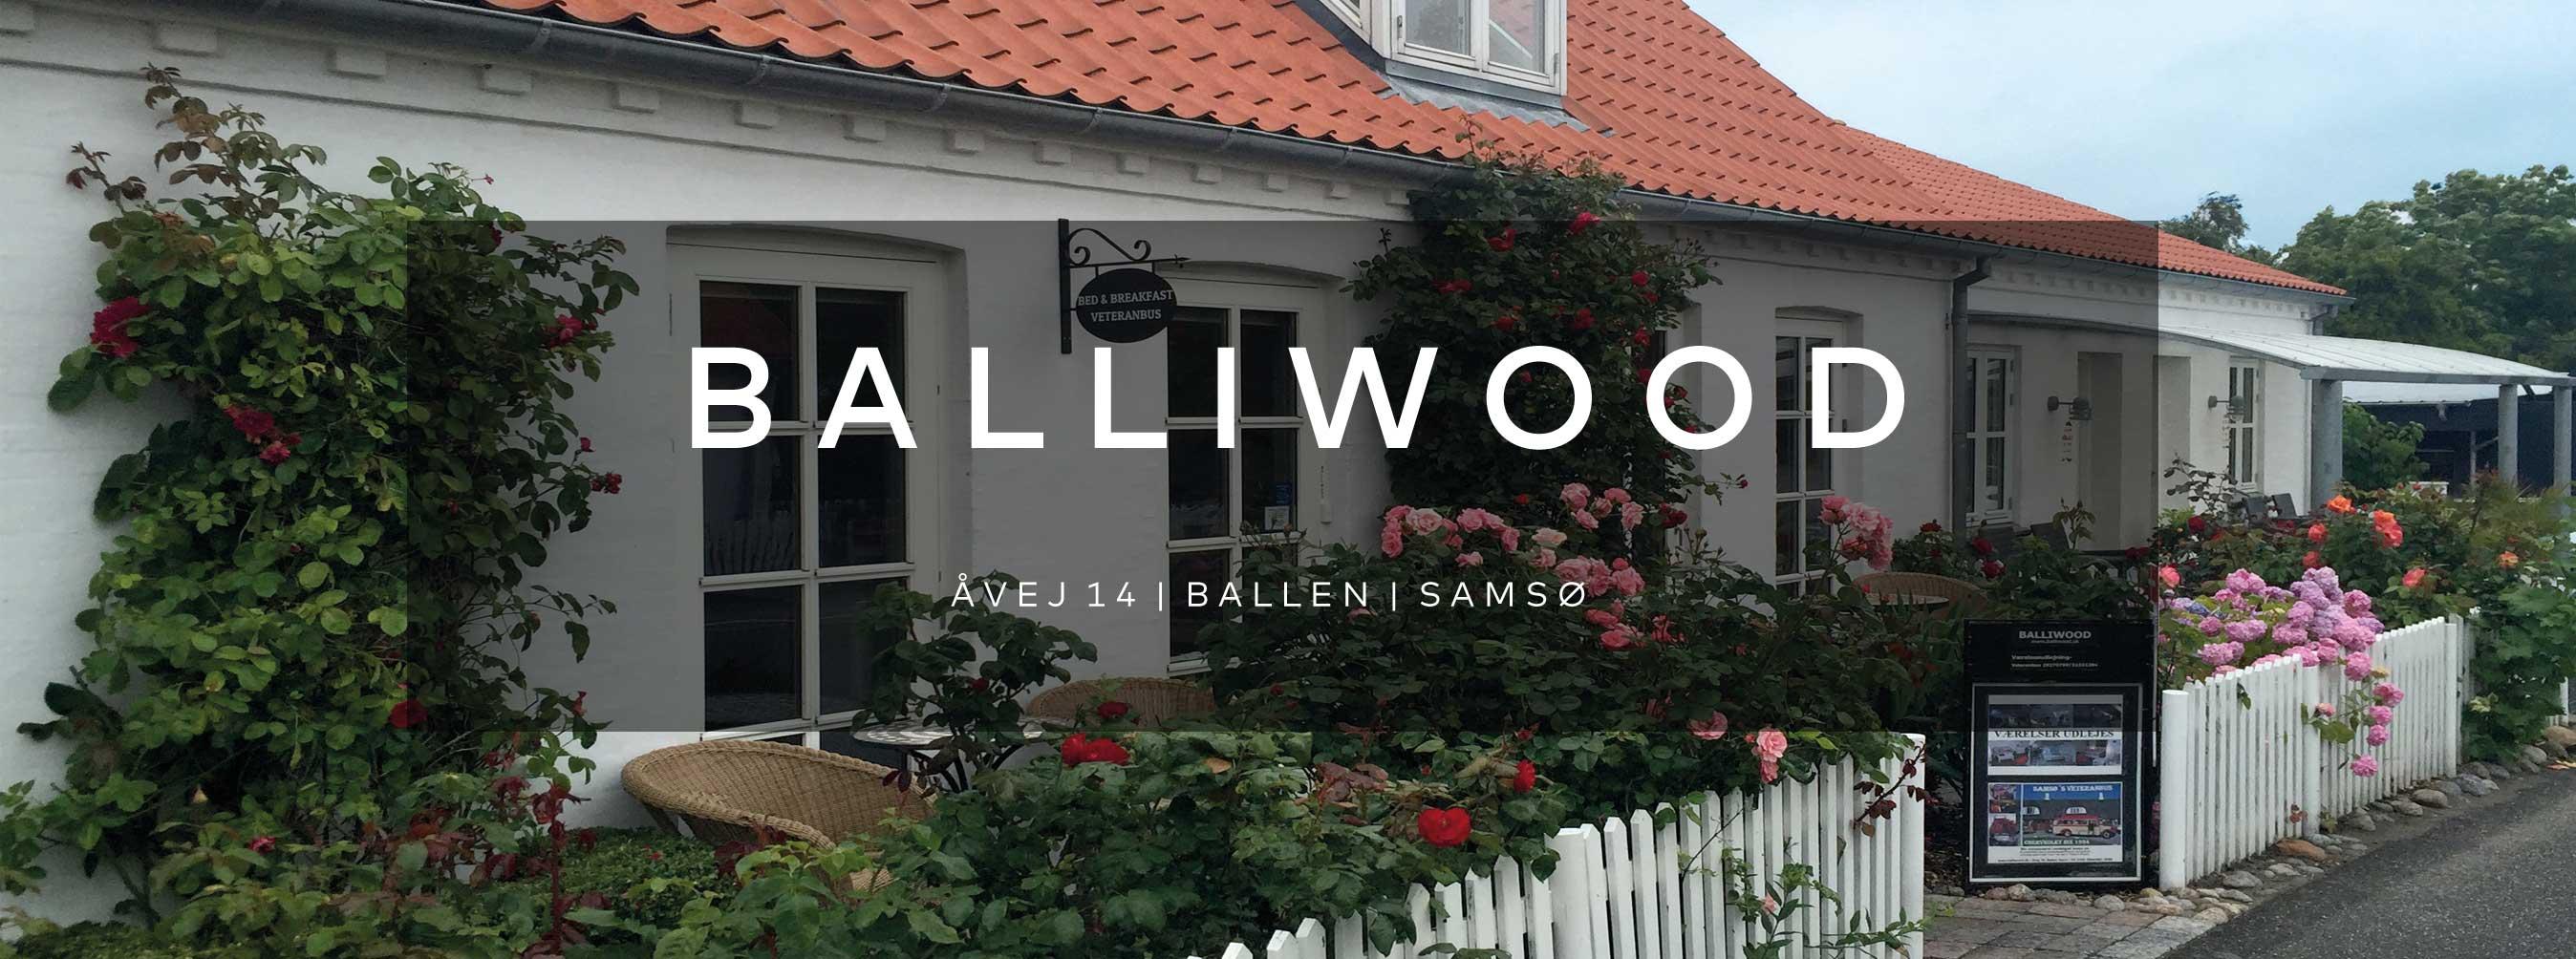 BALLIWOOD-FORSIDE-1